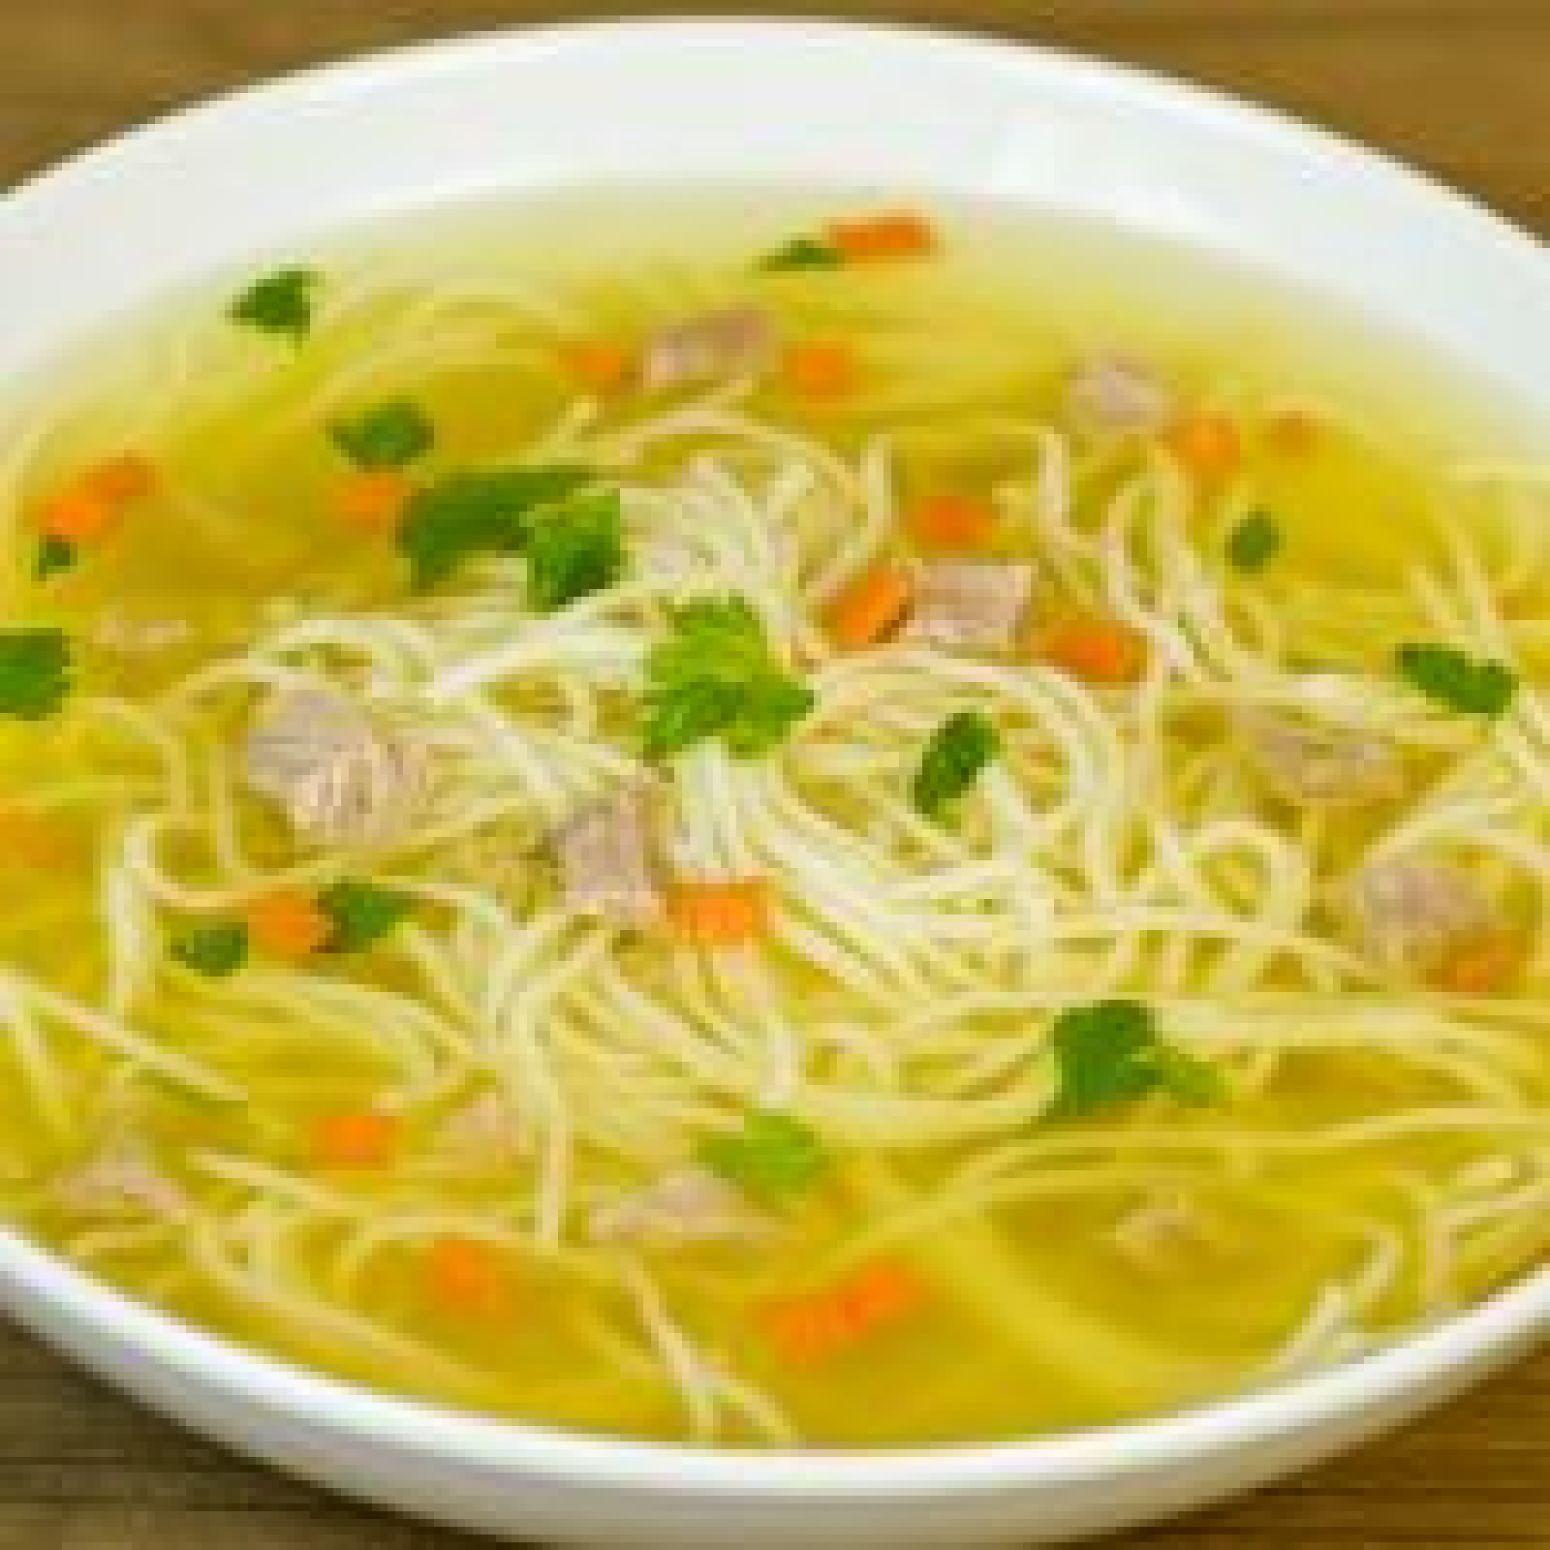 Delicious Chicken Noodle Soup In A Crockpot Recipe